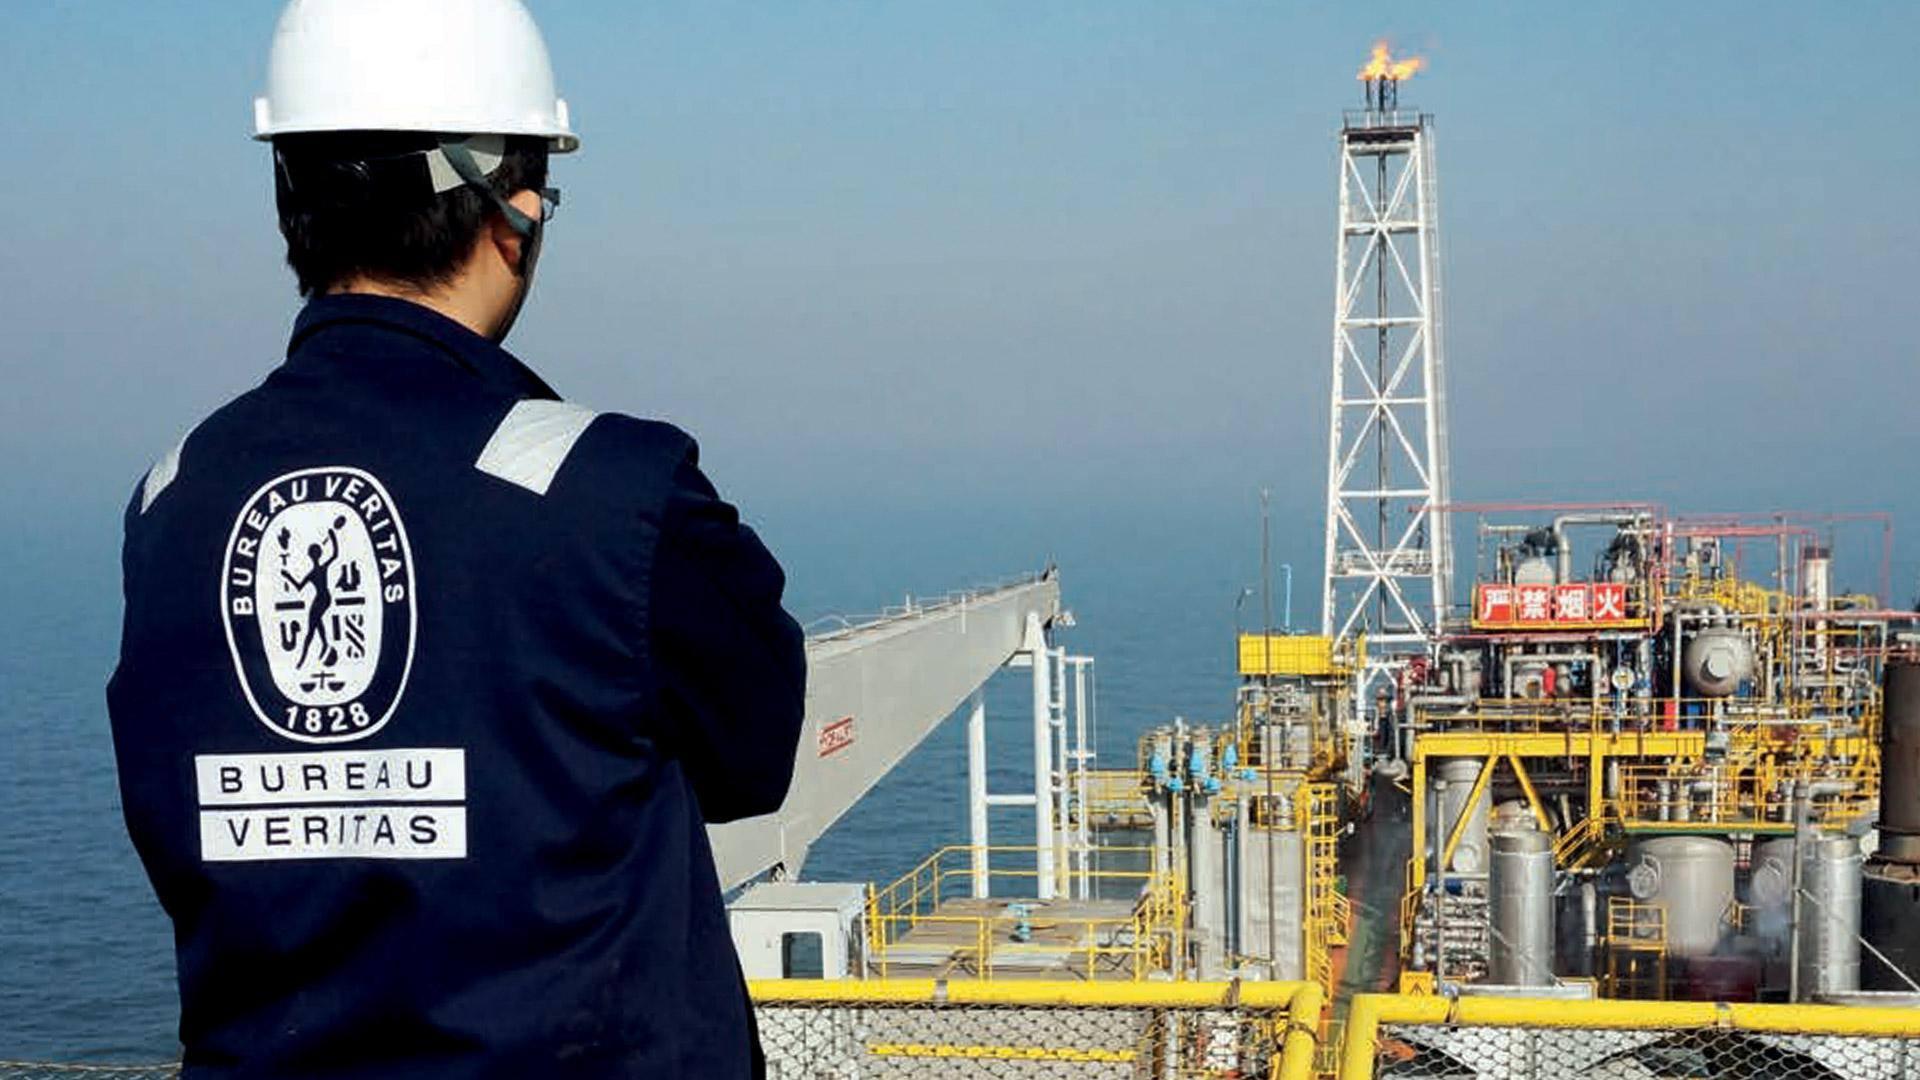 Offshore energy bureau veritas - Bureau veritas head office ...